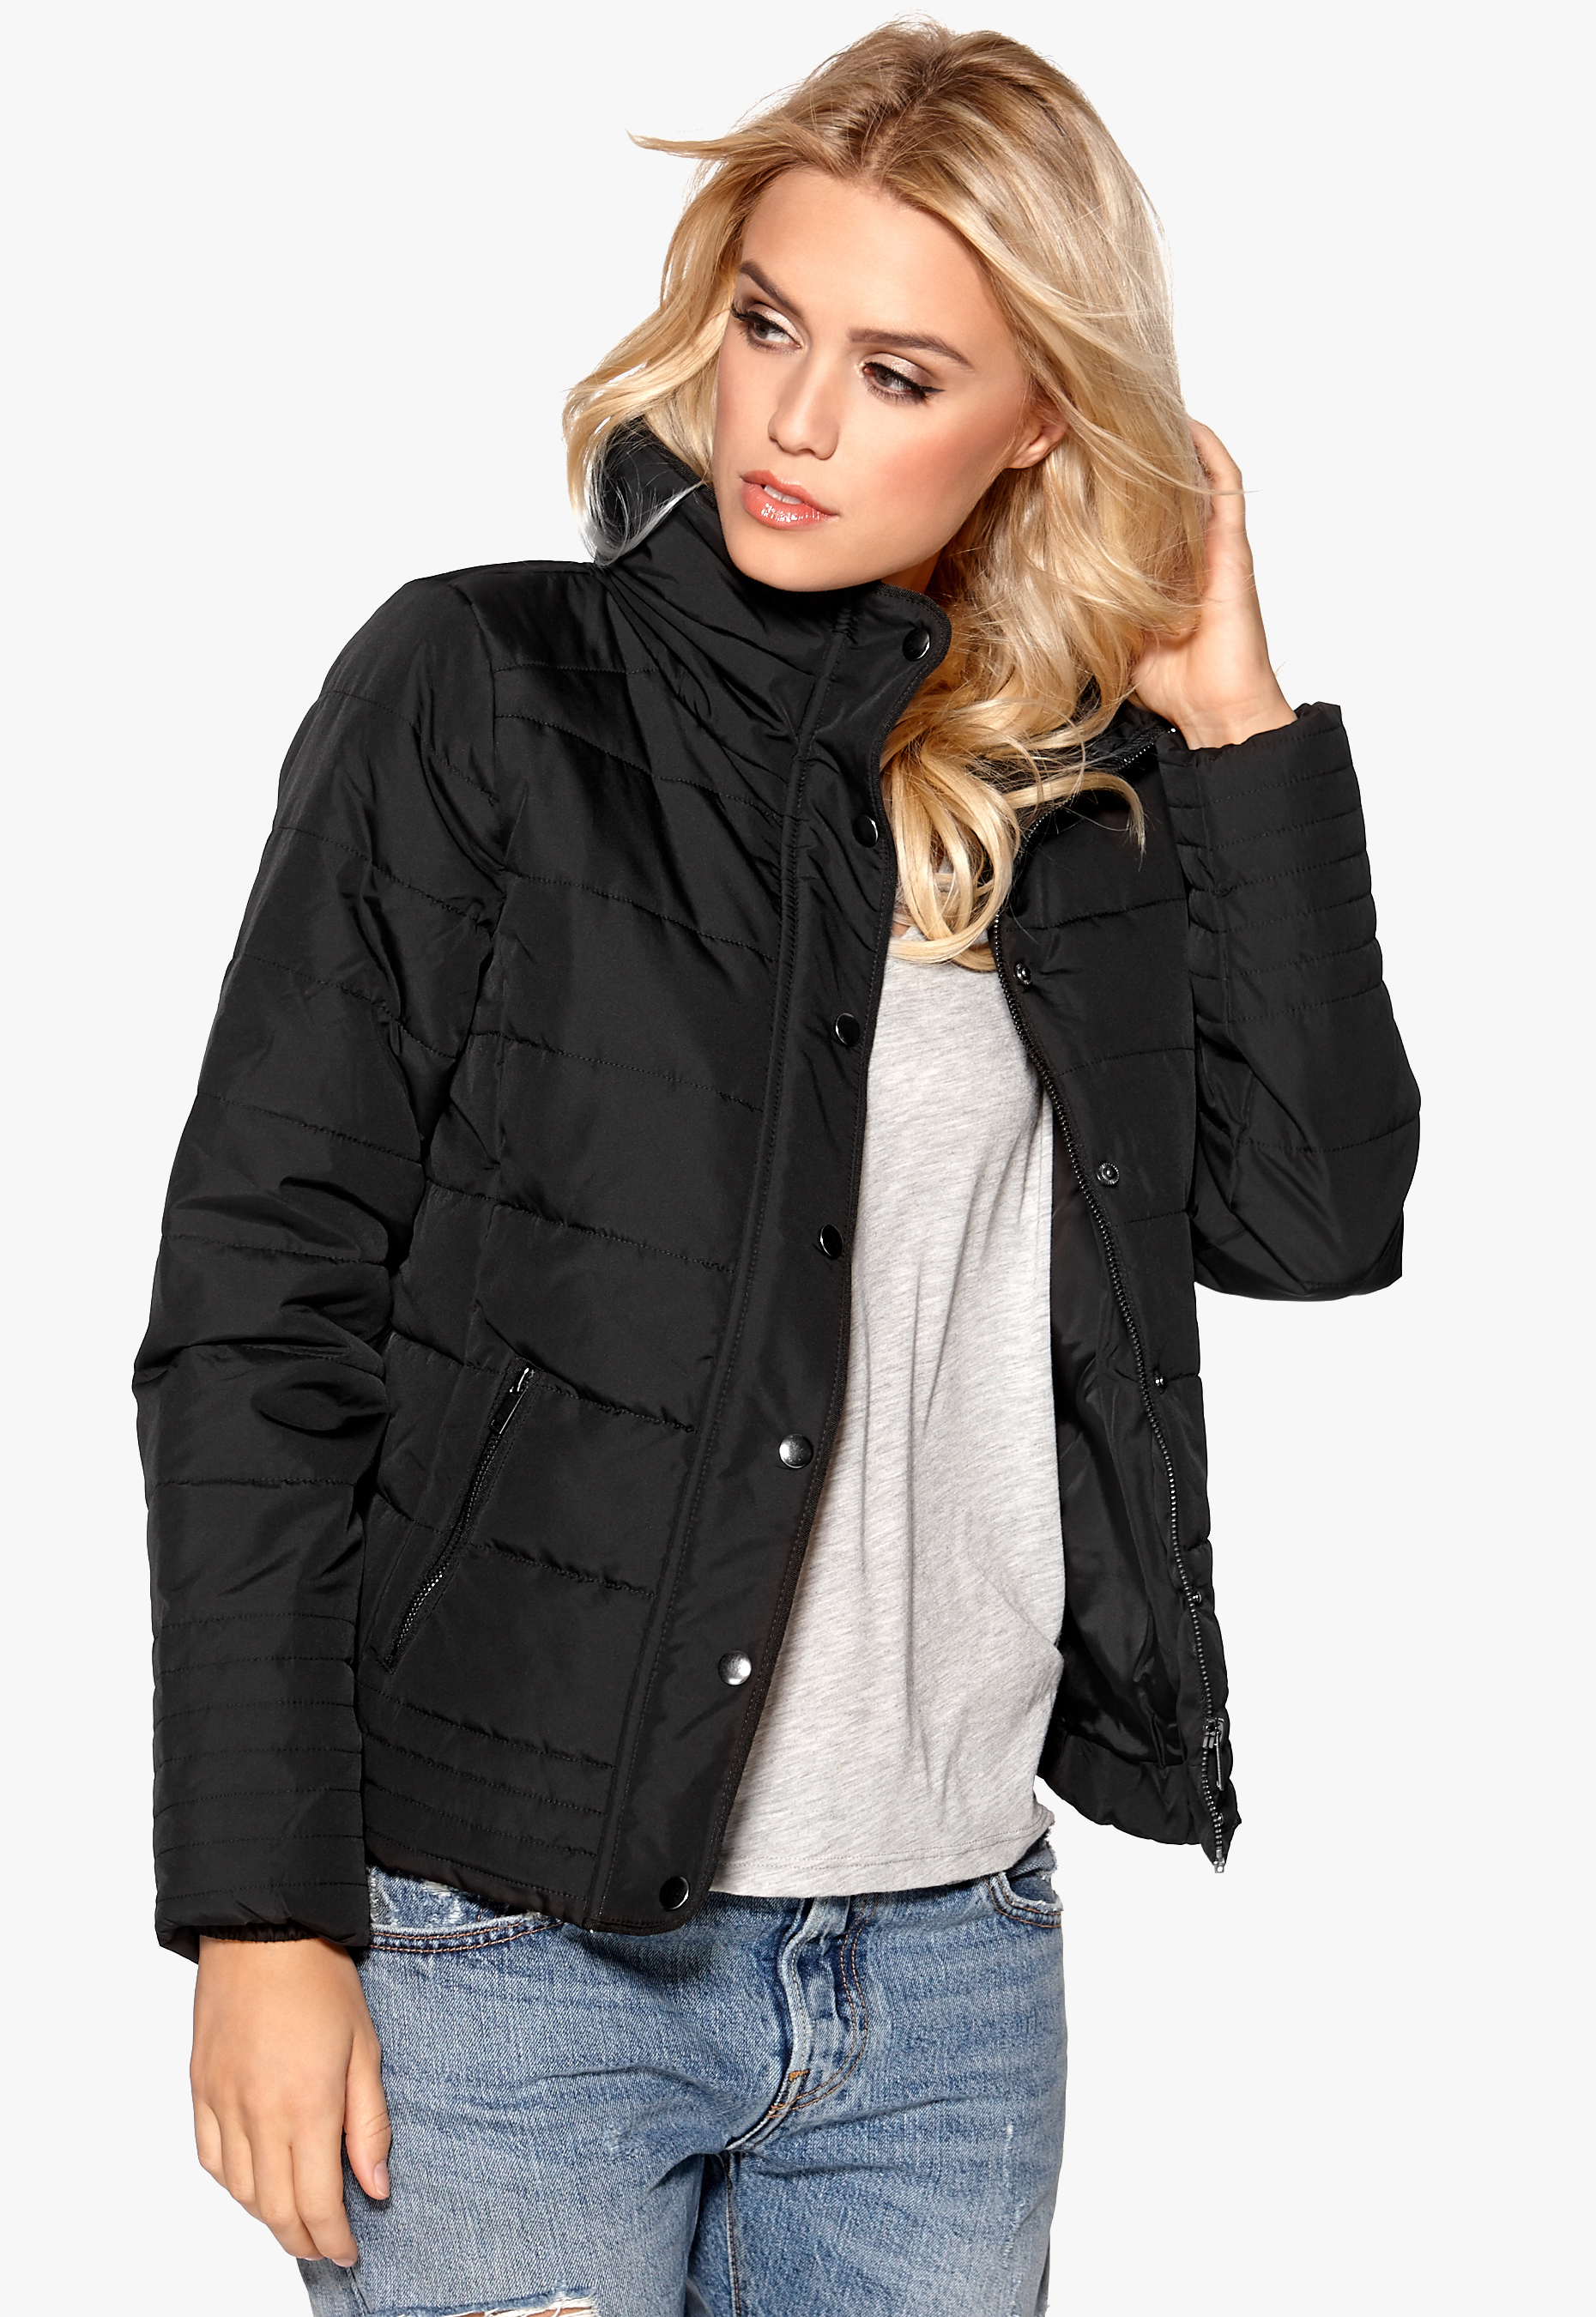 VILA Lonar New Padded Jacket Black - Bubbleroom 389094bb58